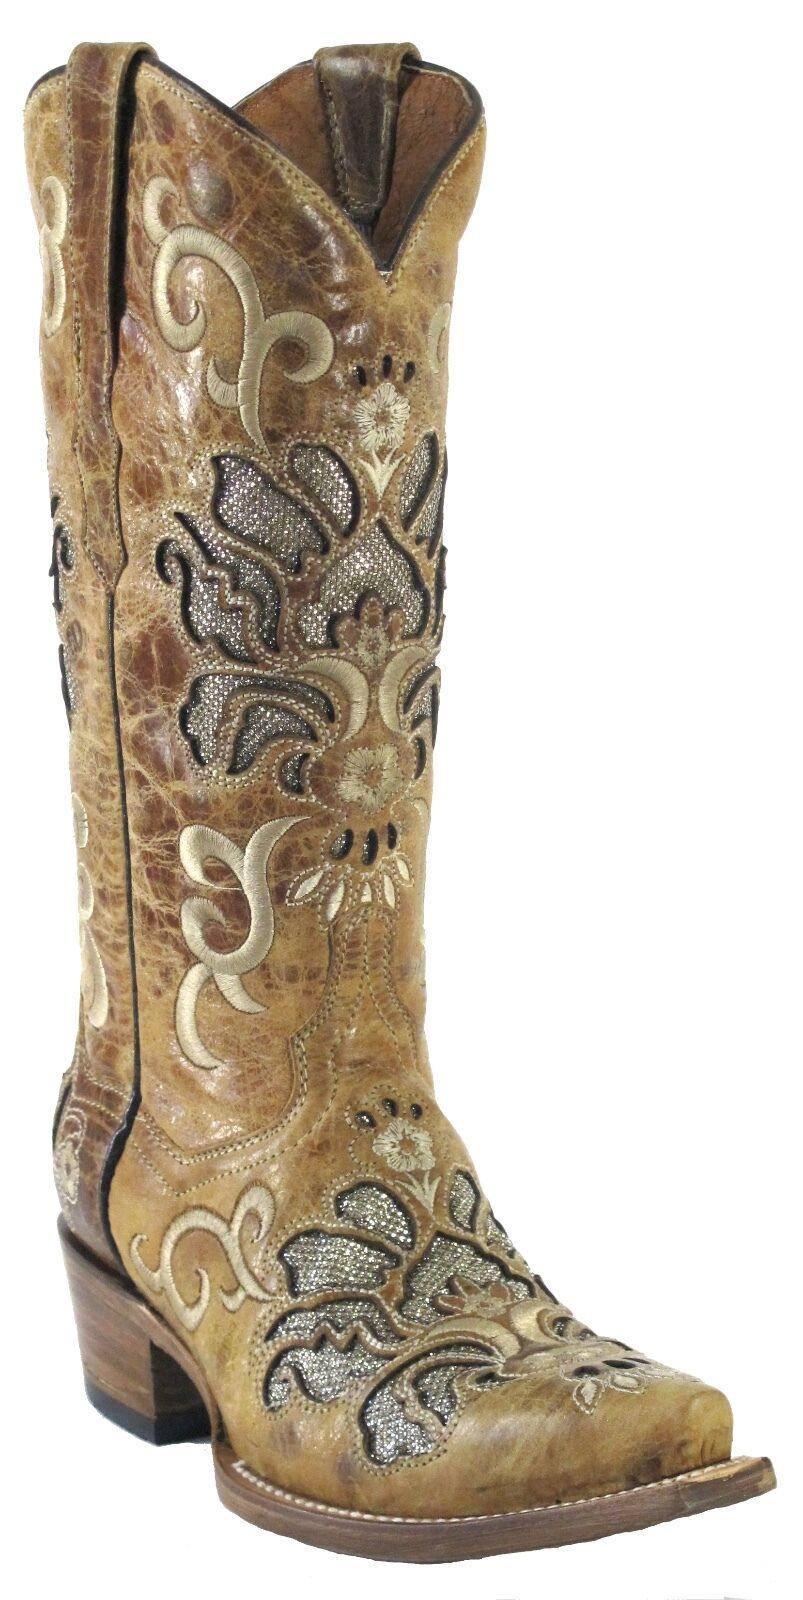 spedizione gratuita Donna  New Overlay  Distressed Leather Cowgirl Western stivali stivali stivali Snip Sand  punto vendita